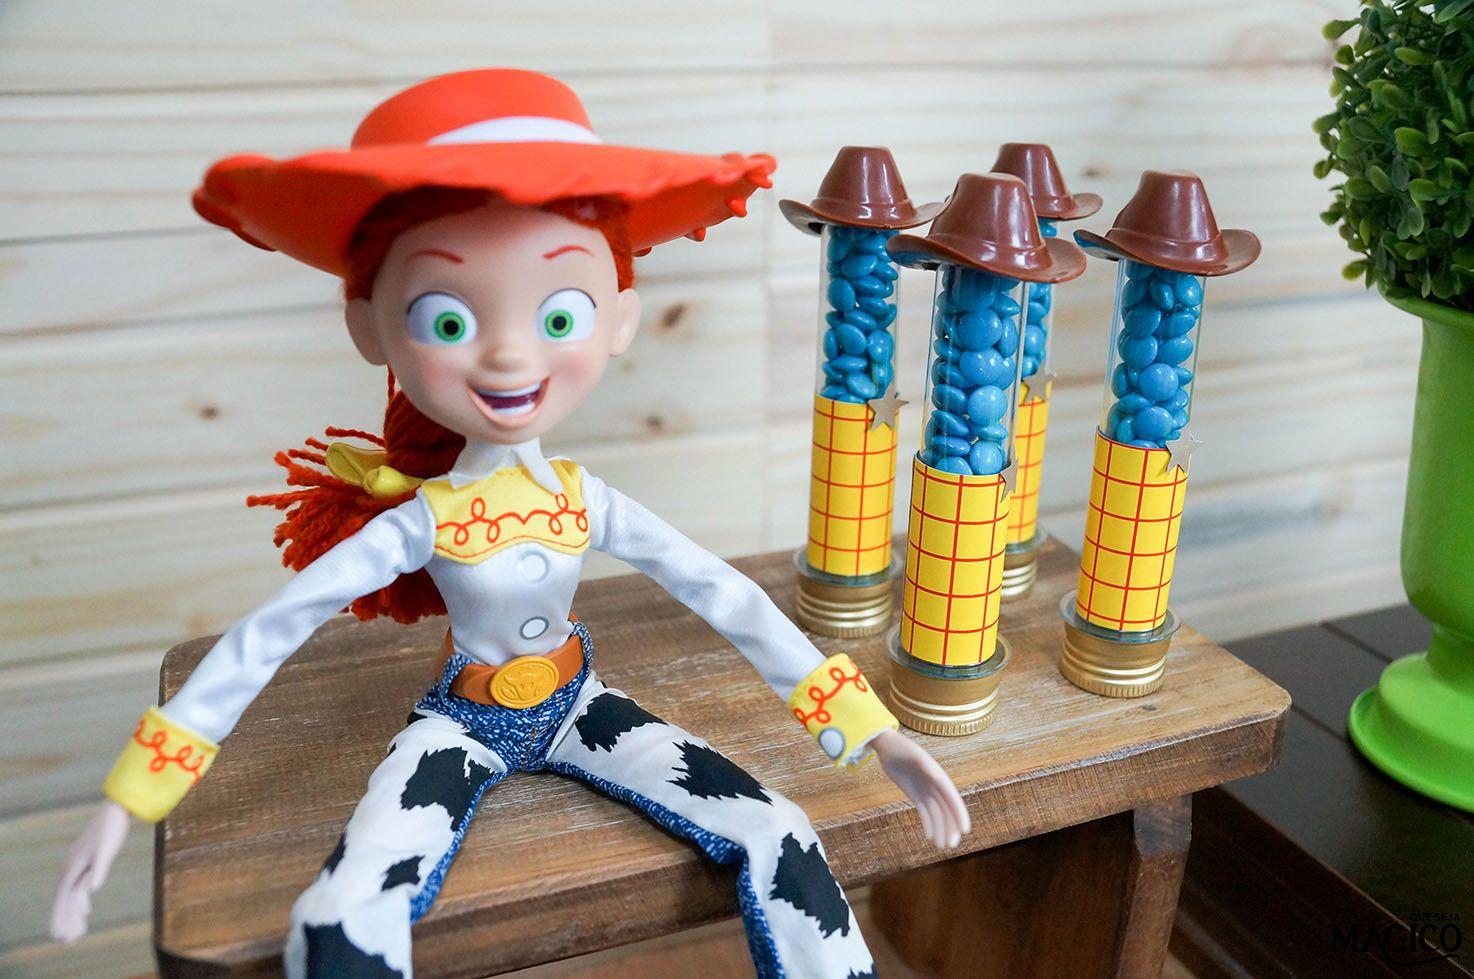 Decoracao Toy Story Premier Decoracao Toy Story Brinquedo